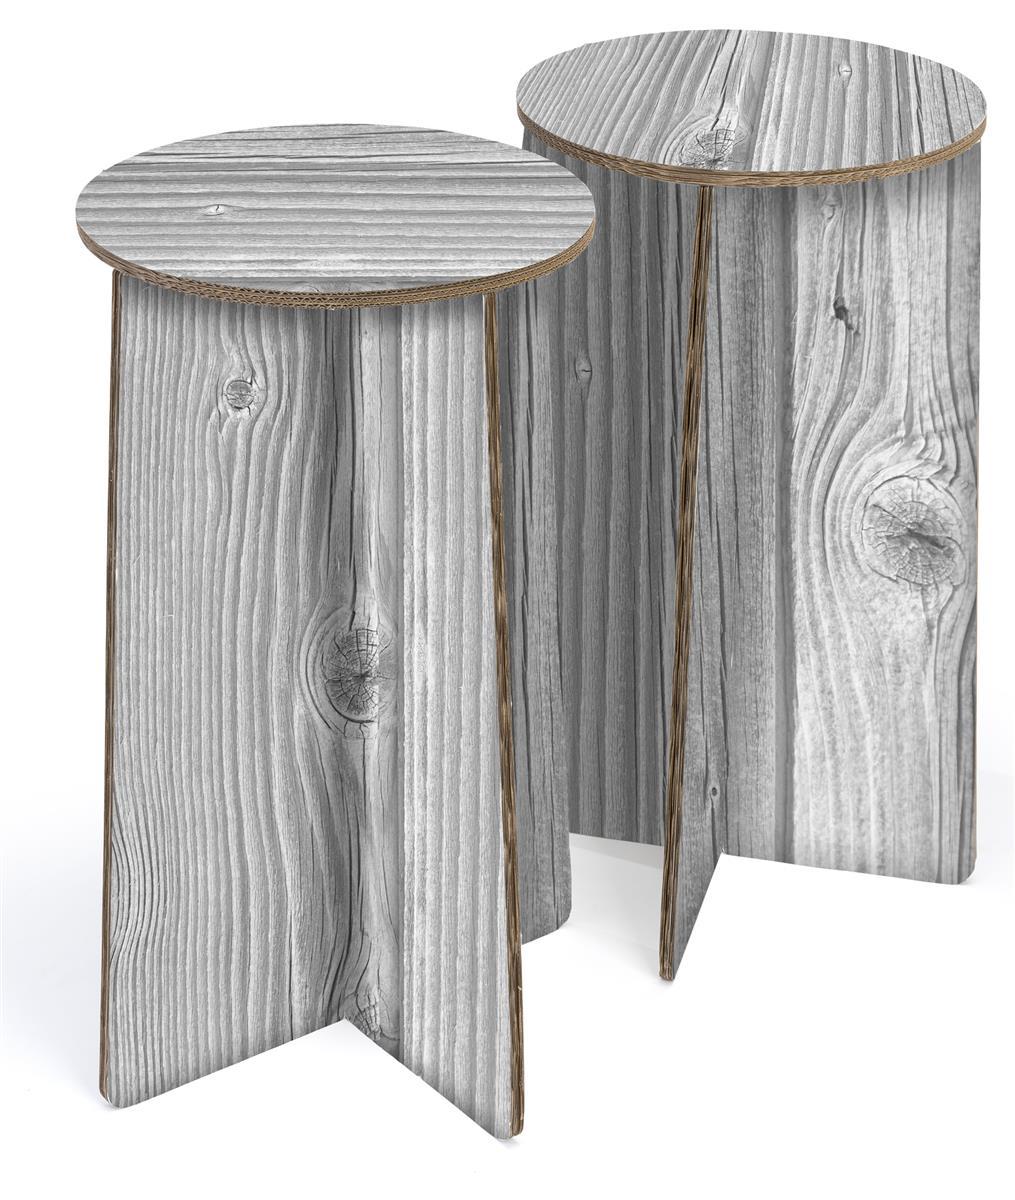 Terrific 28H Round Cardboard Stool Set Of 2 Ships Flat Gray Wood Theyellowbook Wood Chair Design Ideas Theyellowbookinfo